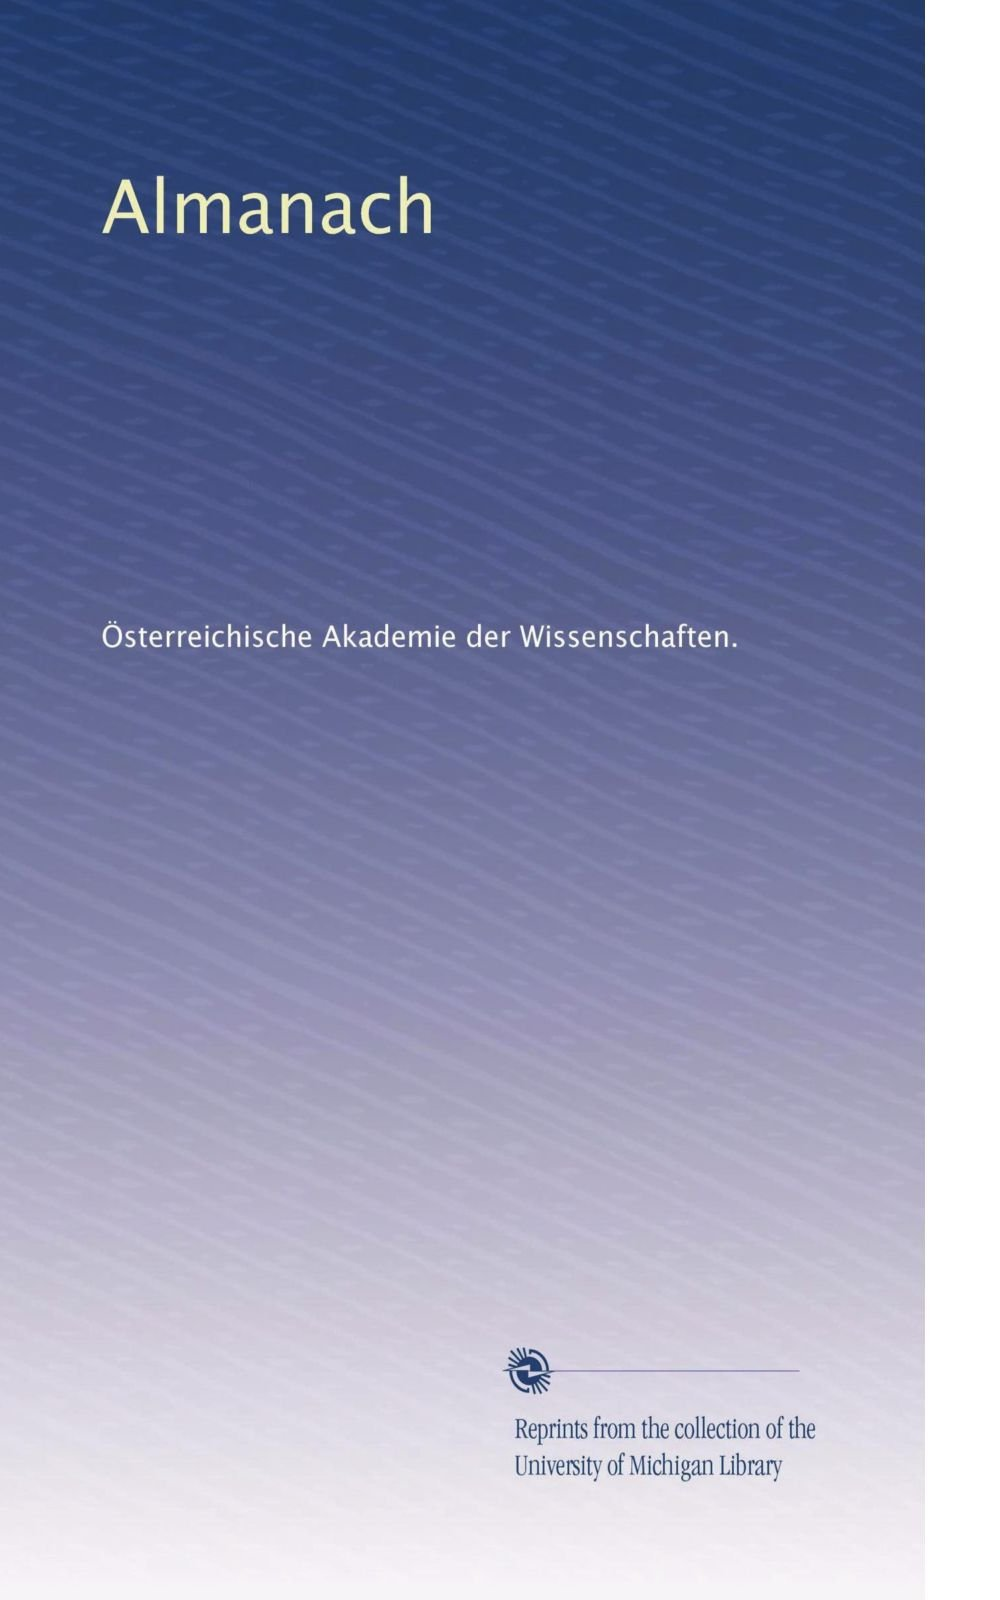 Download Almanach (Volume 27) (German Edition) PDF